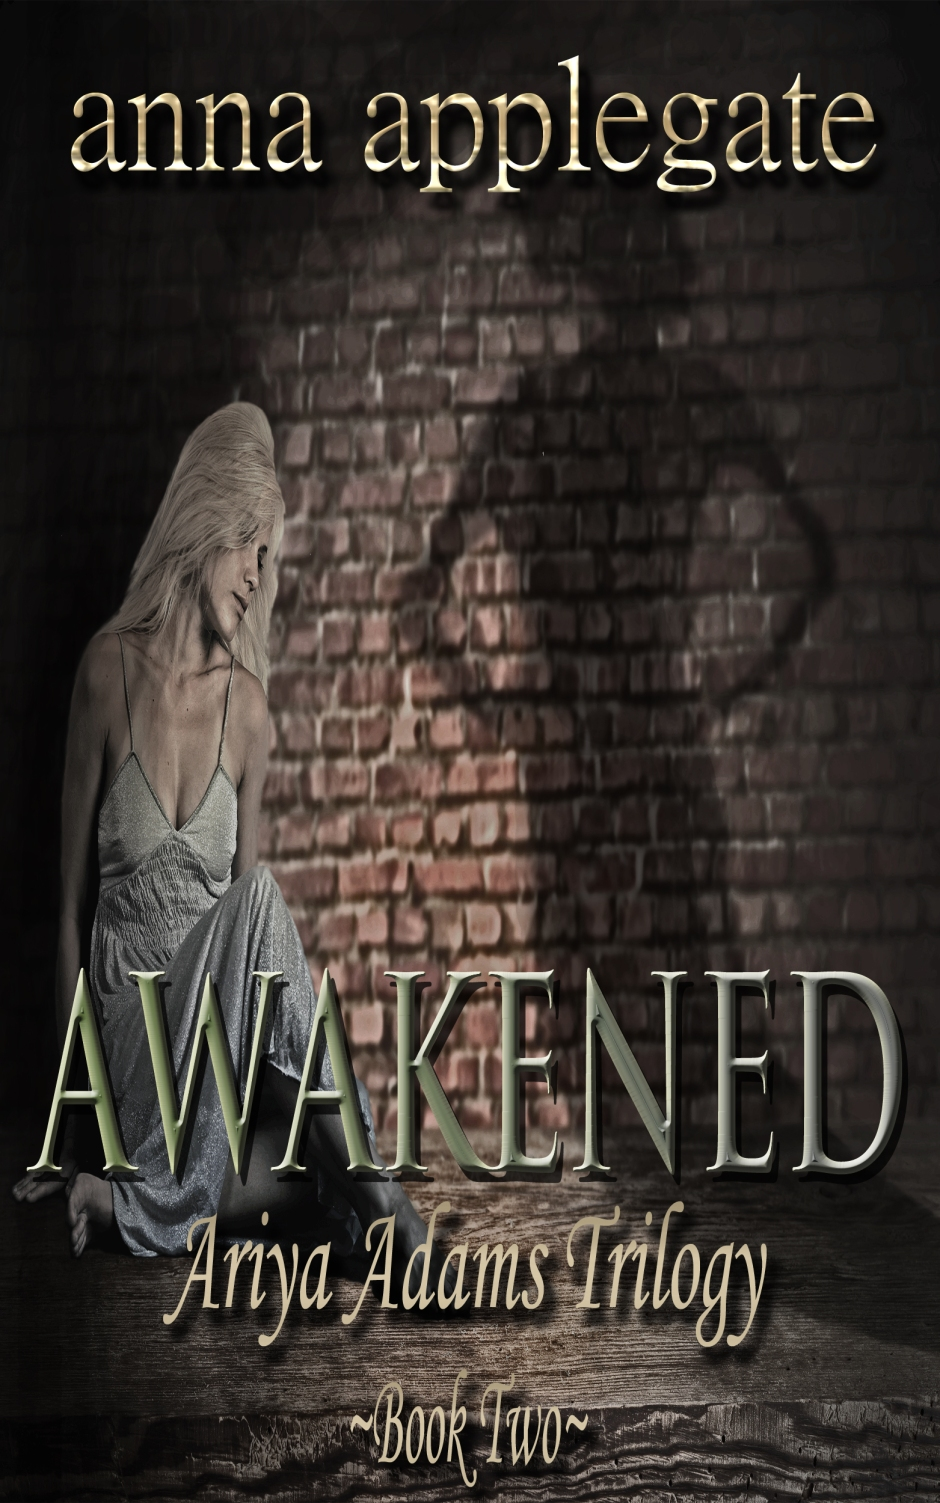 Awakened Book 2 Ariya Adams Cover